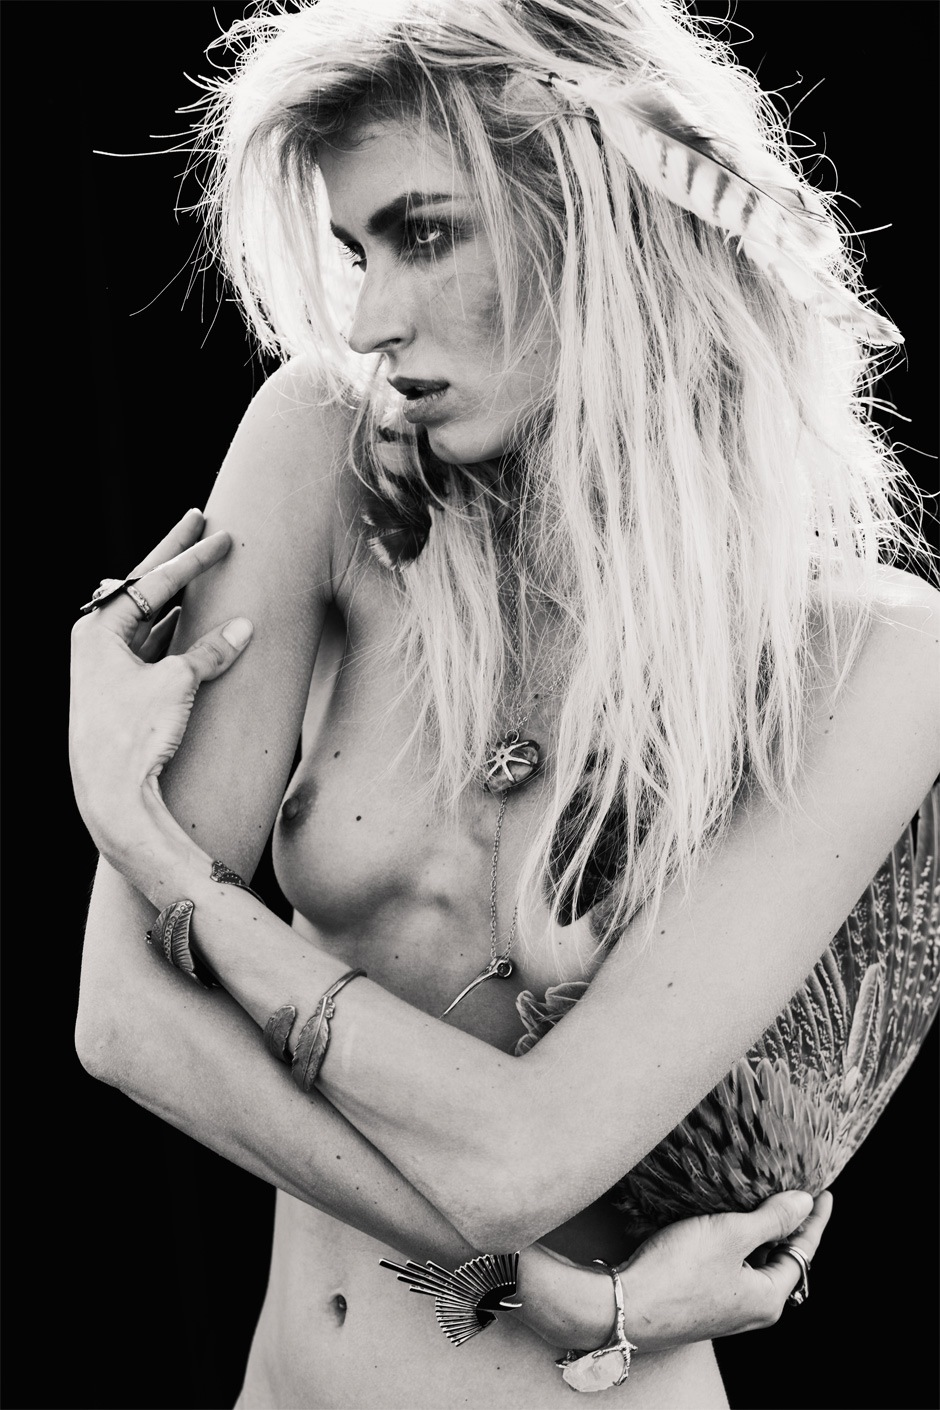 Milena-Aaron_Feaver-Confashion_Magazine-06-fashionising.jpeg